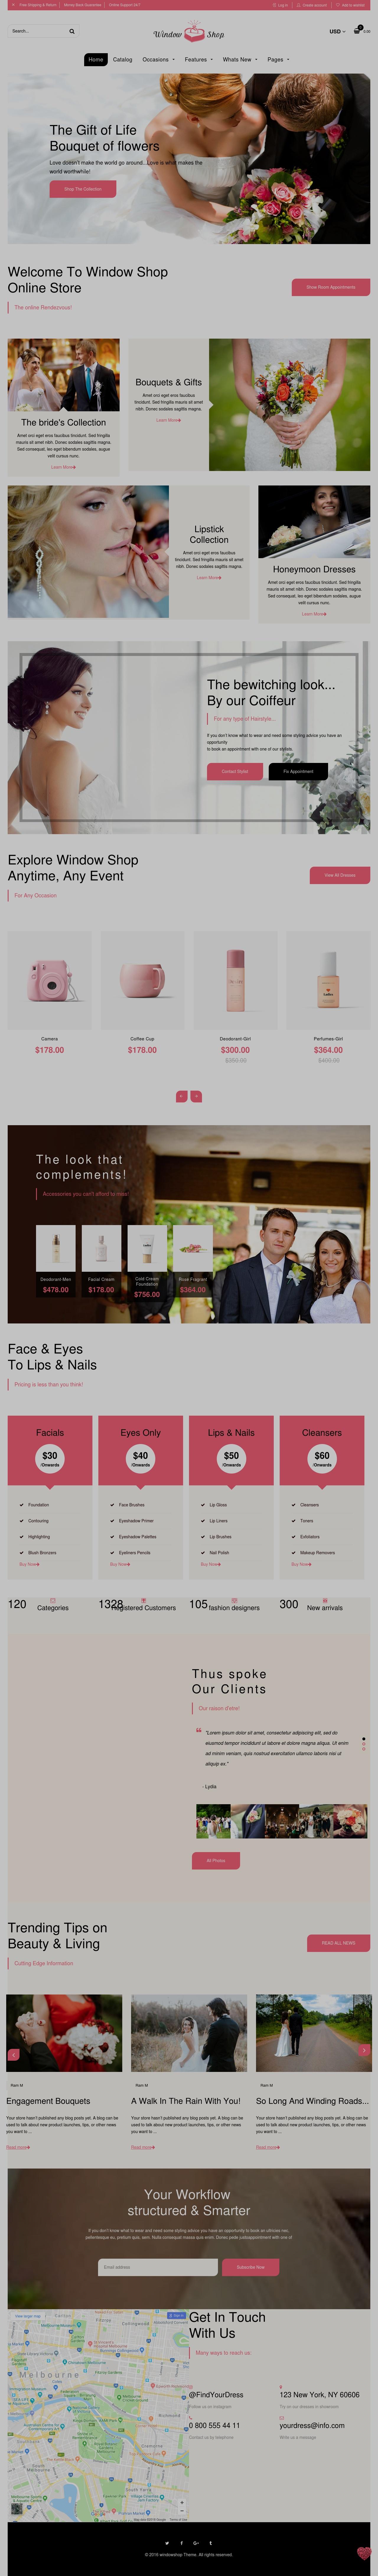 Shopify Theme for Wedding Store Shop Wedding Shopify Theme